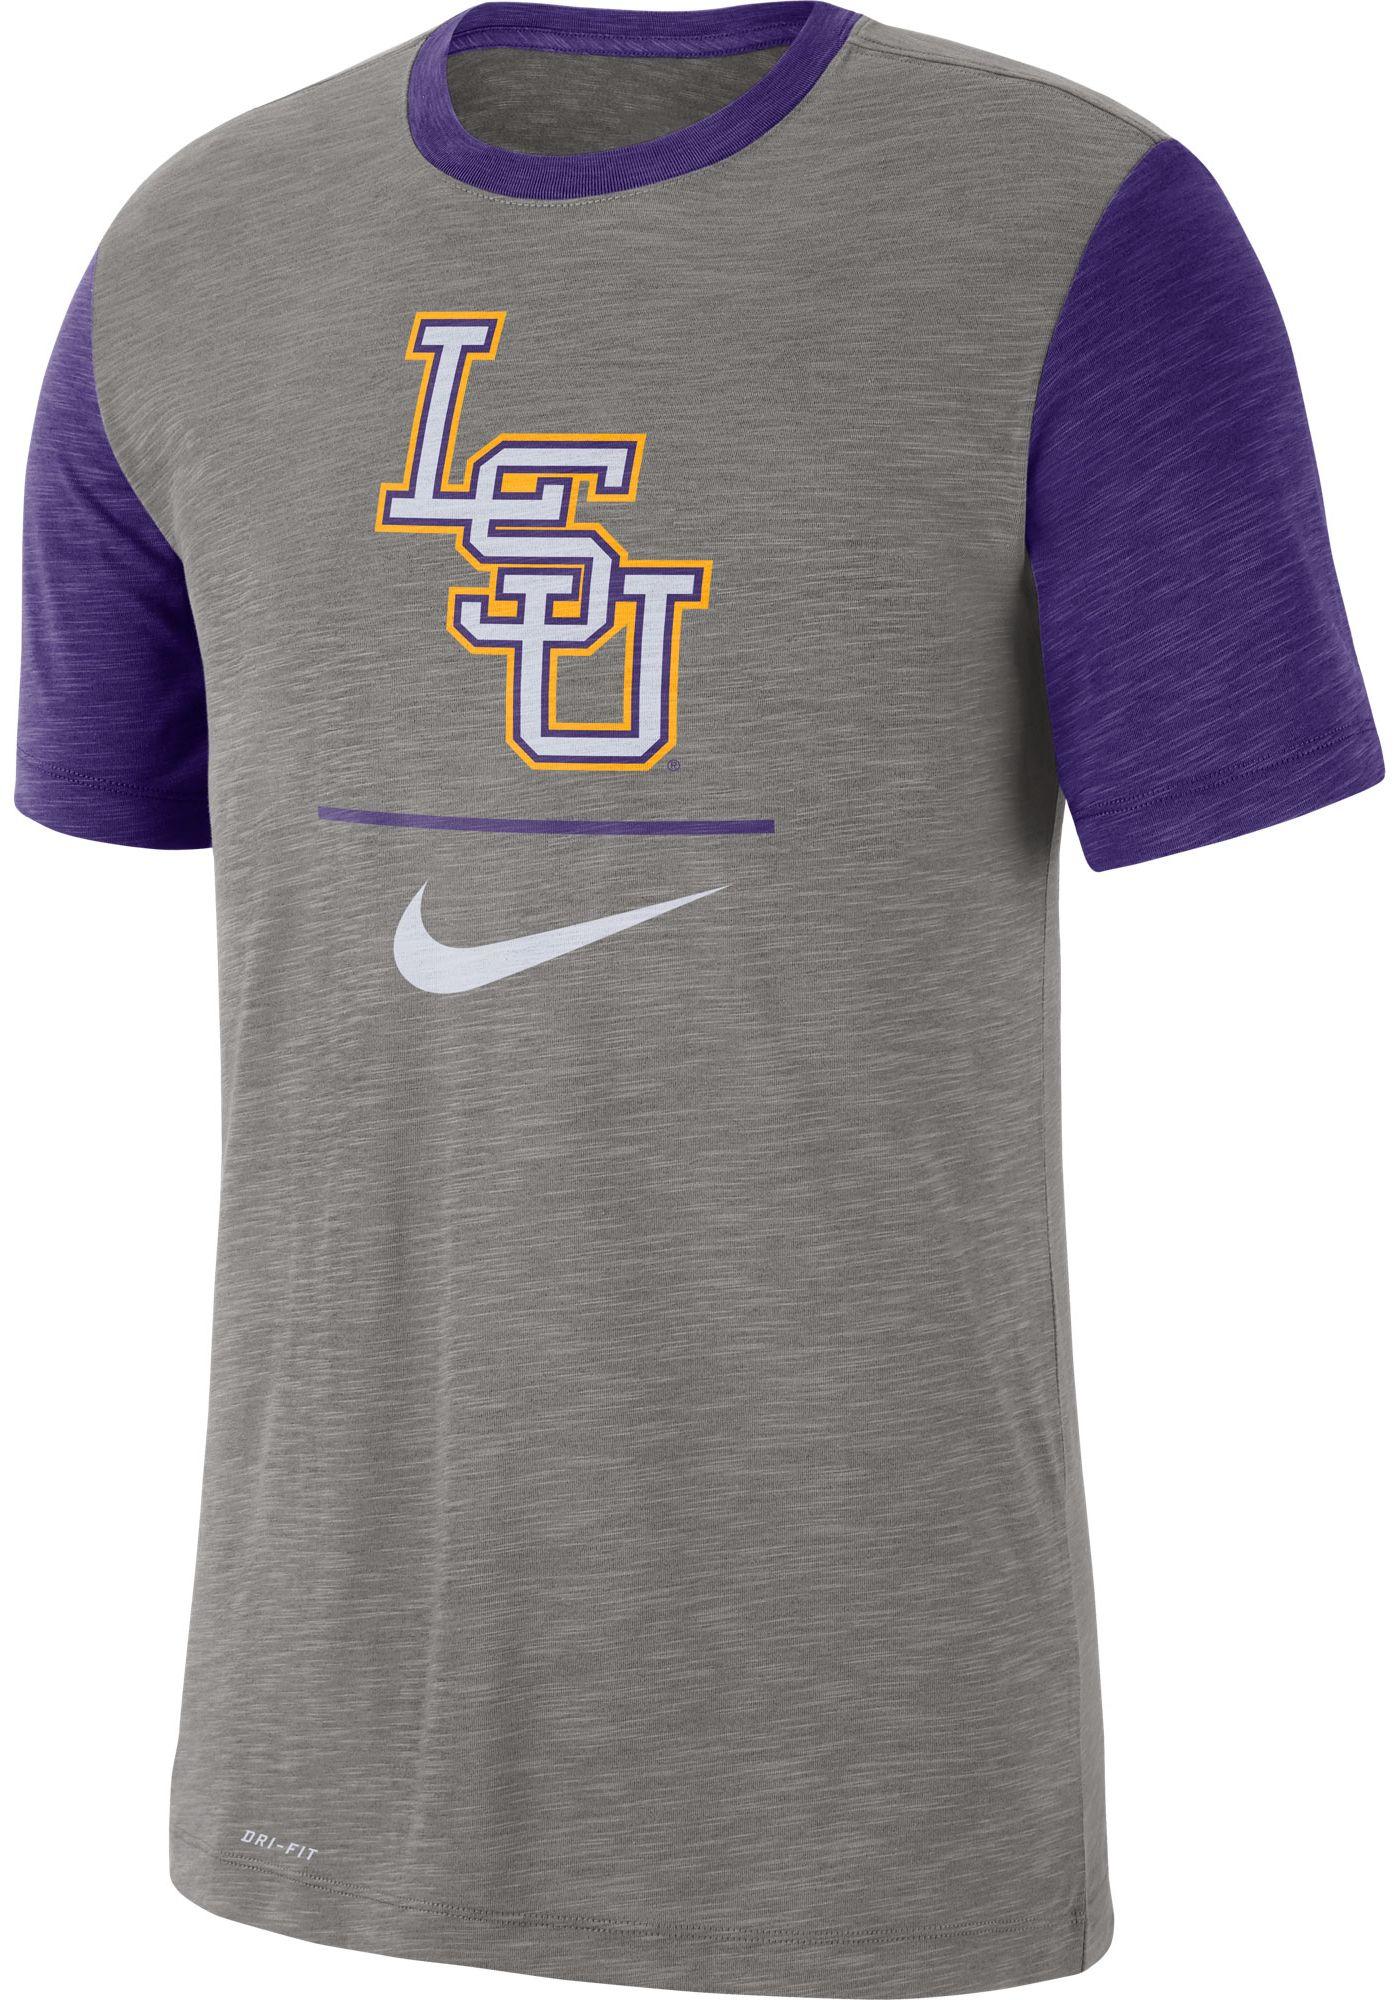 Nike Men's LSU Tigers Grey Dri-FIT Baseball Slub T-Shirt